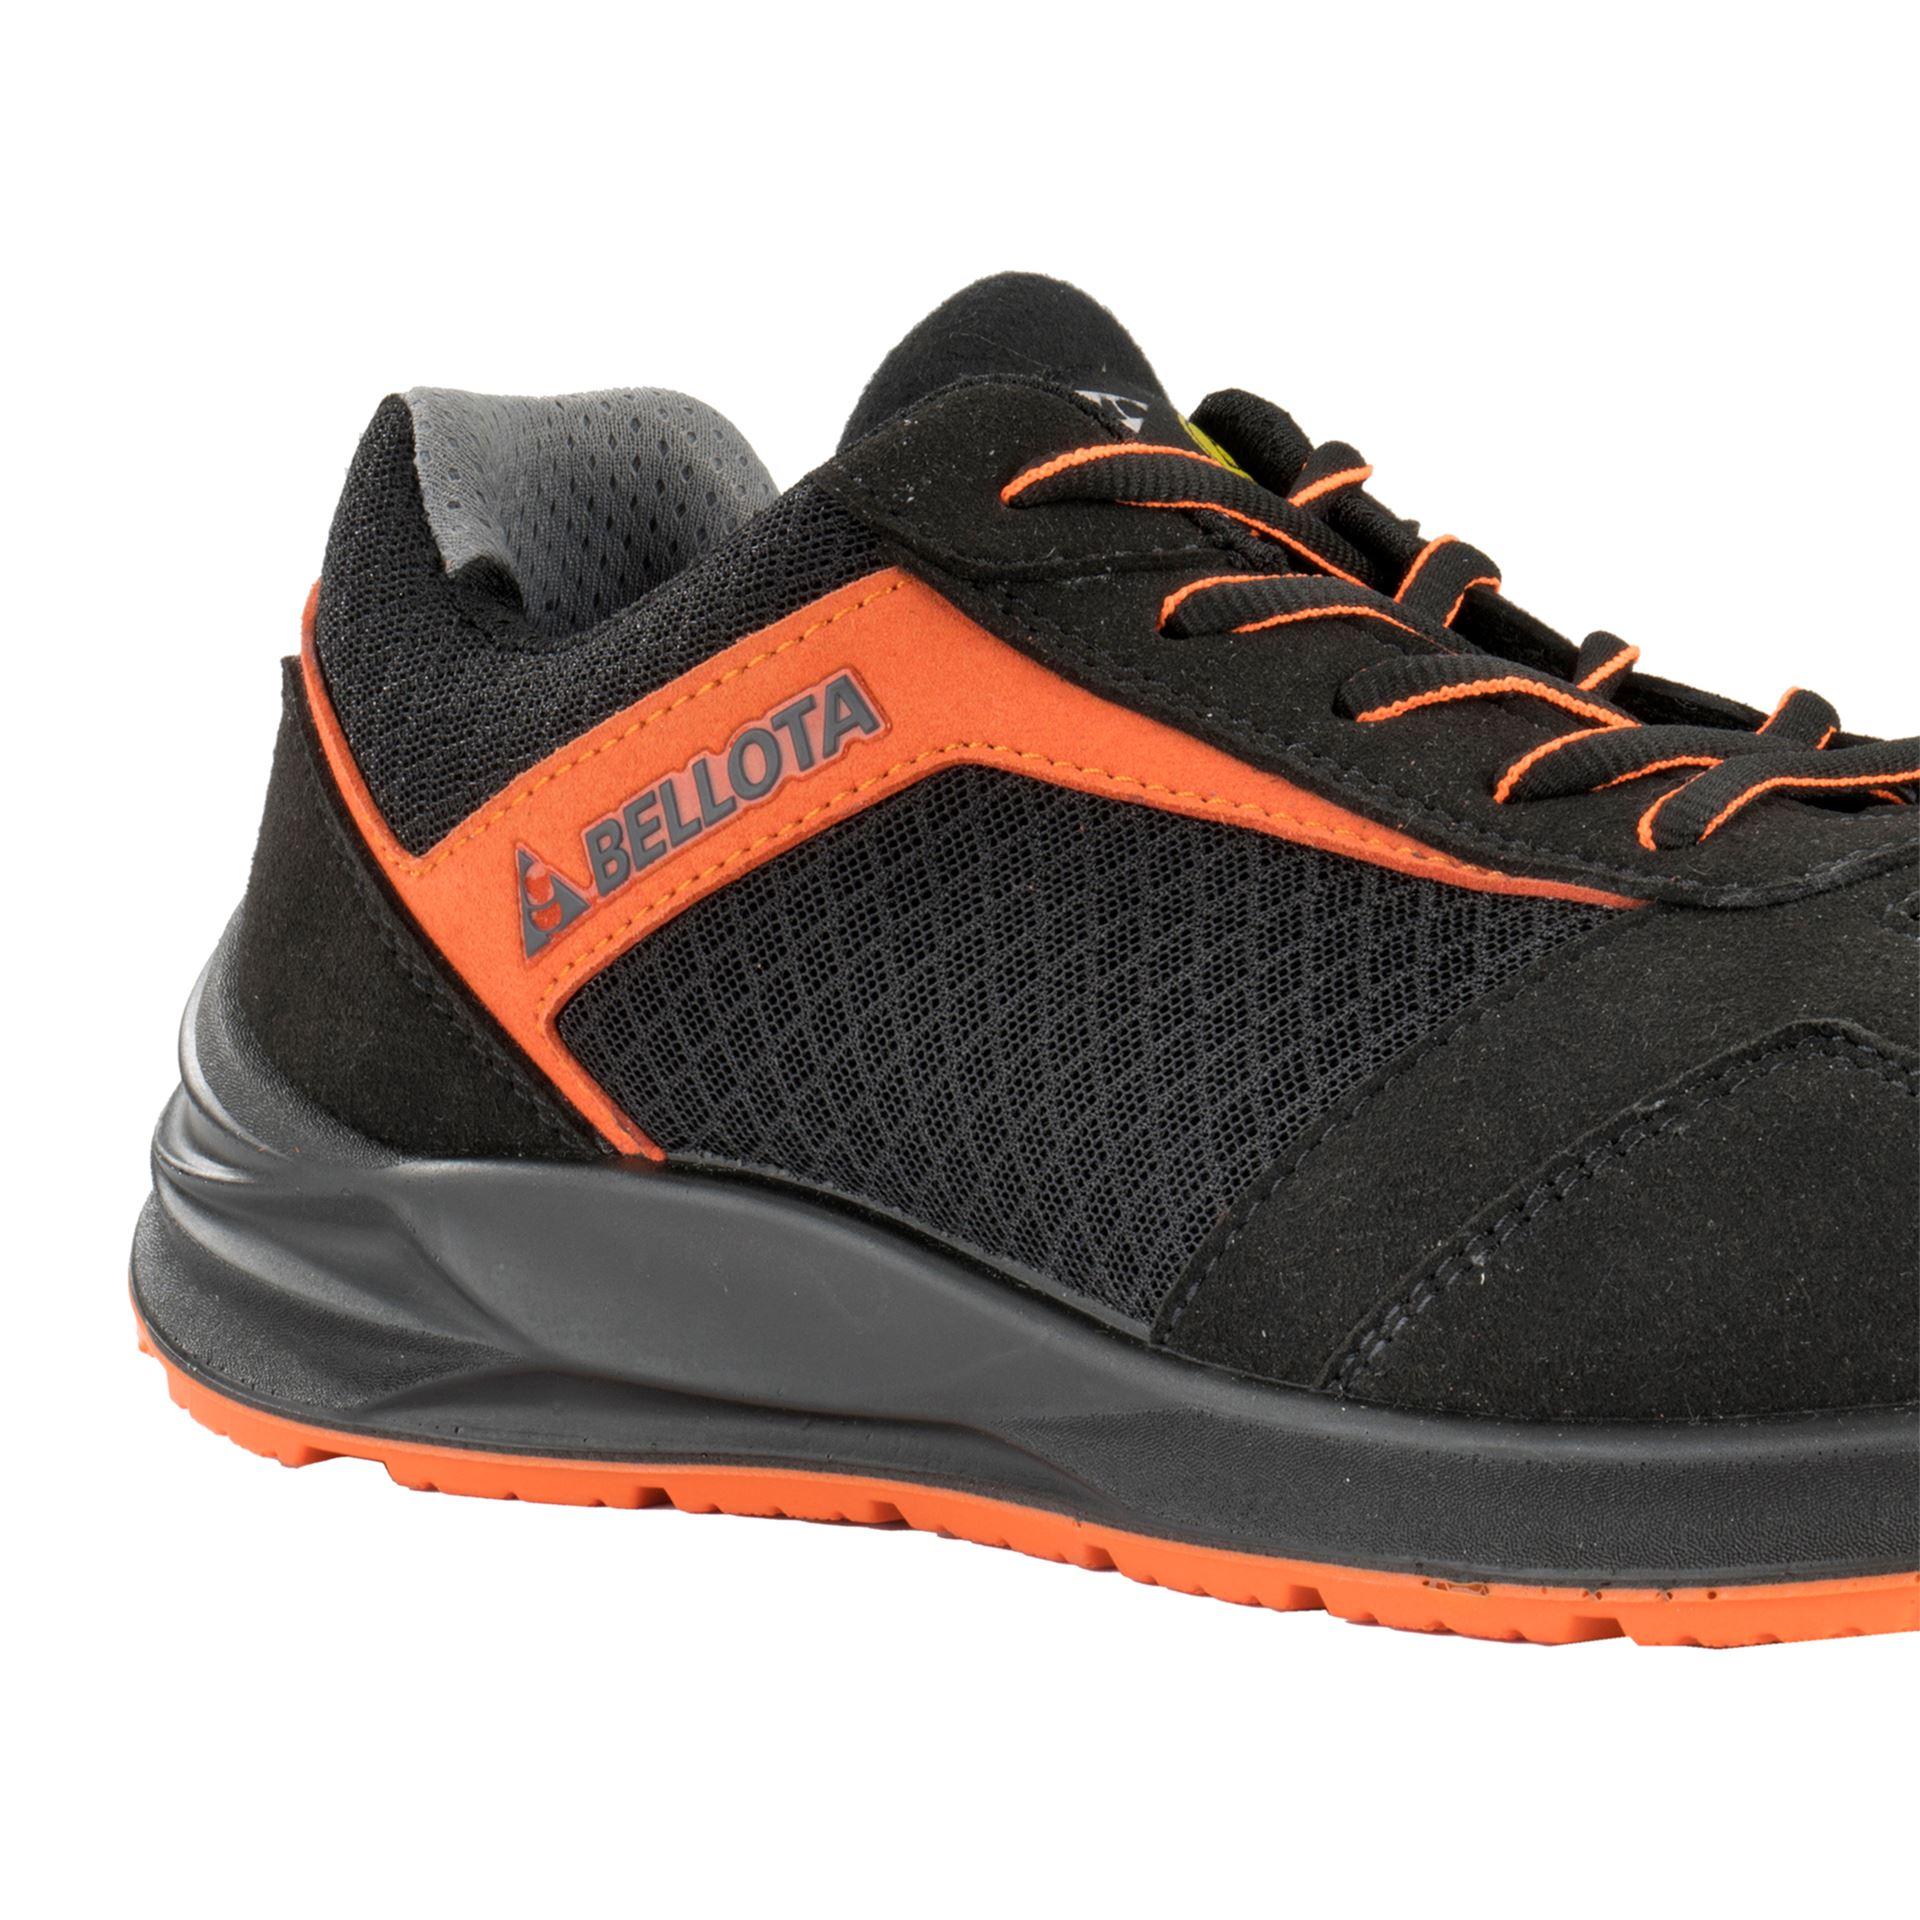 Imagen de Zapato seguridad S1P Bellota Flex negro-naranja FTW05